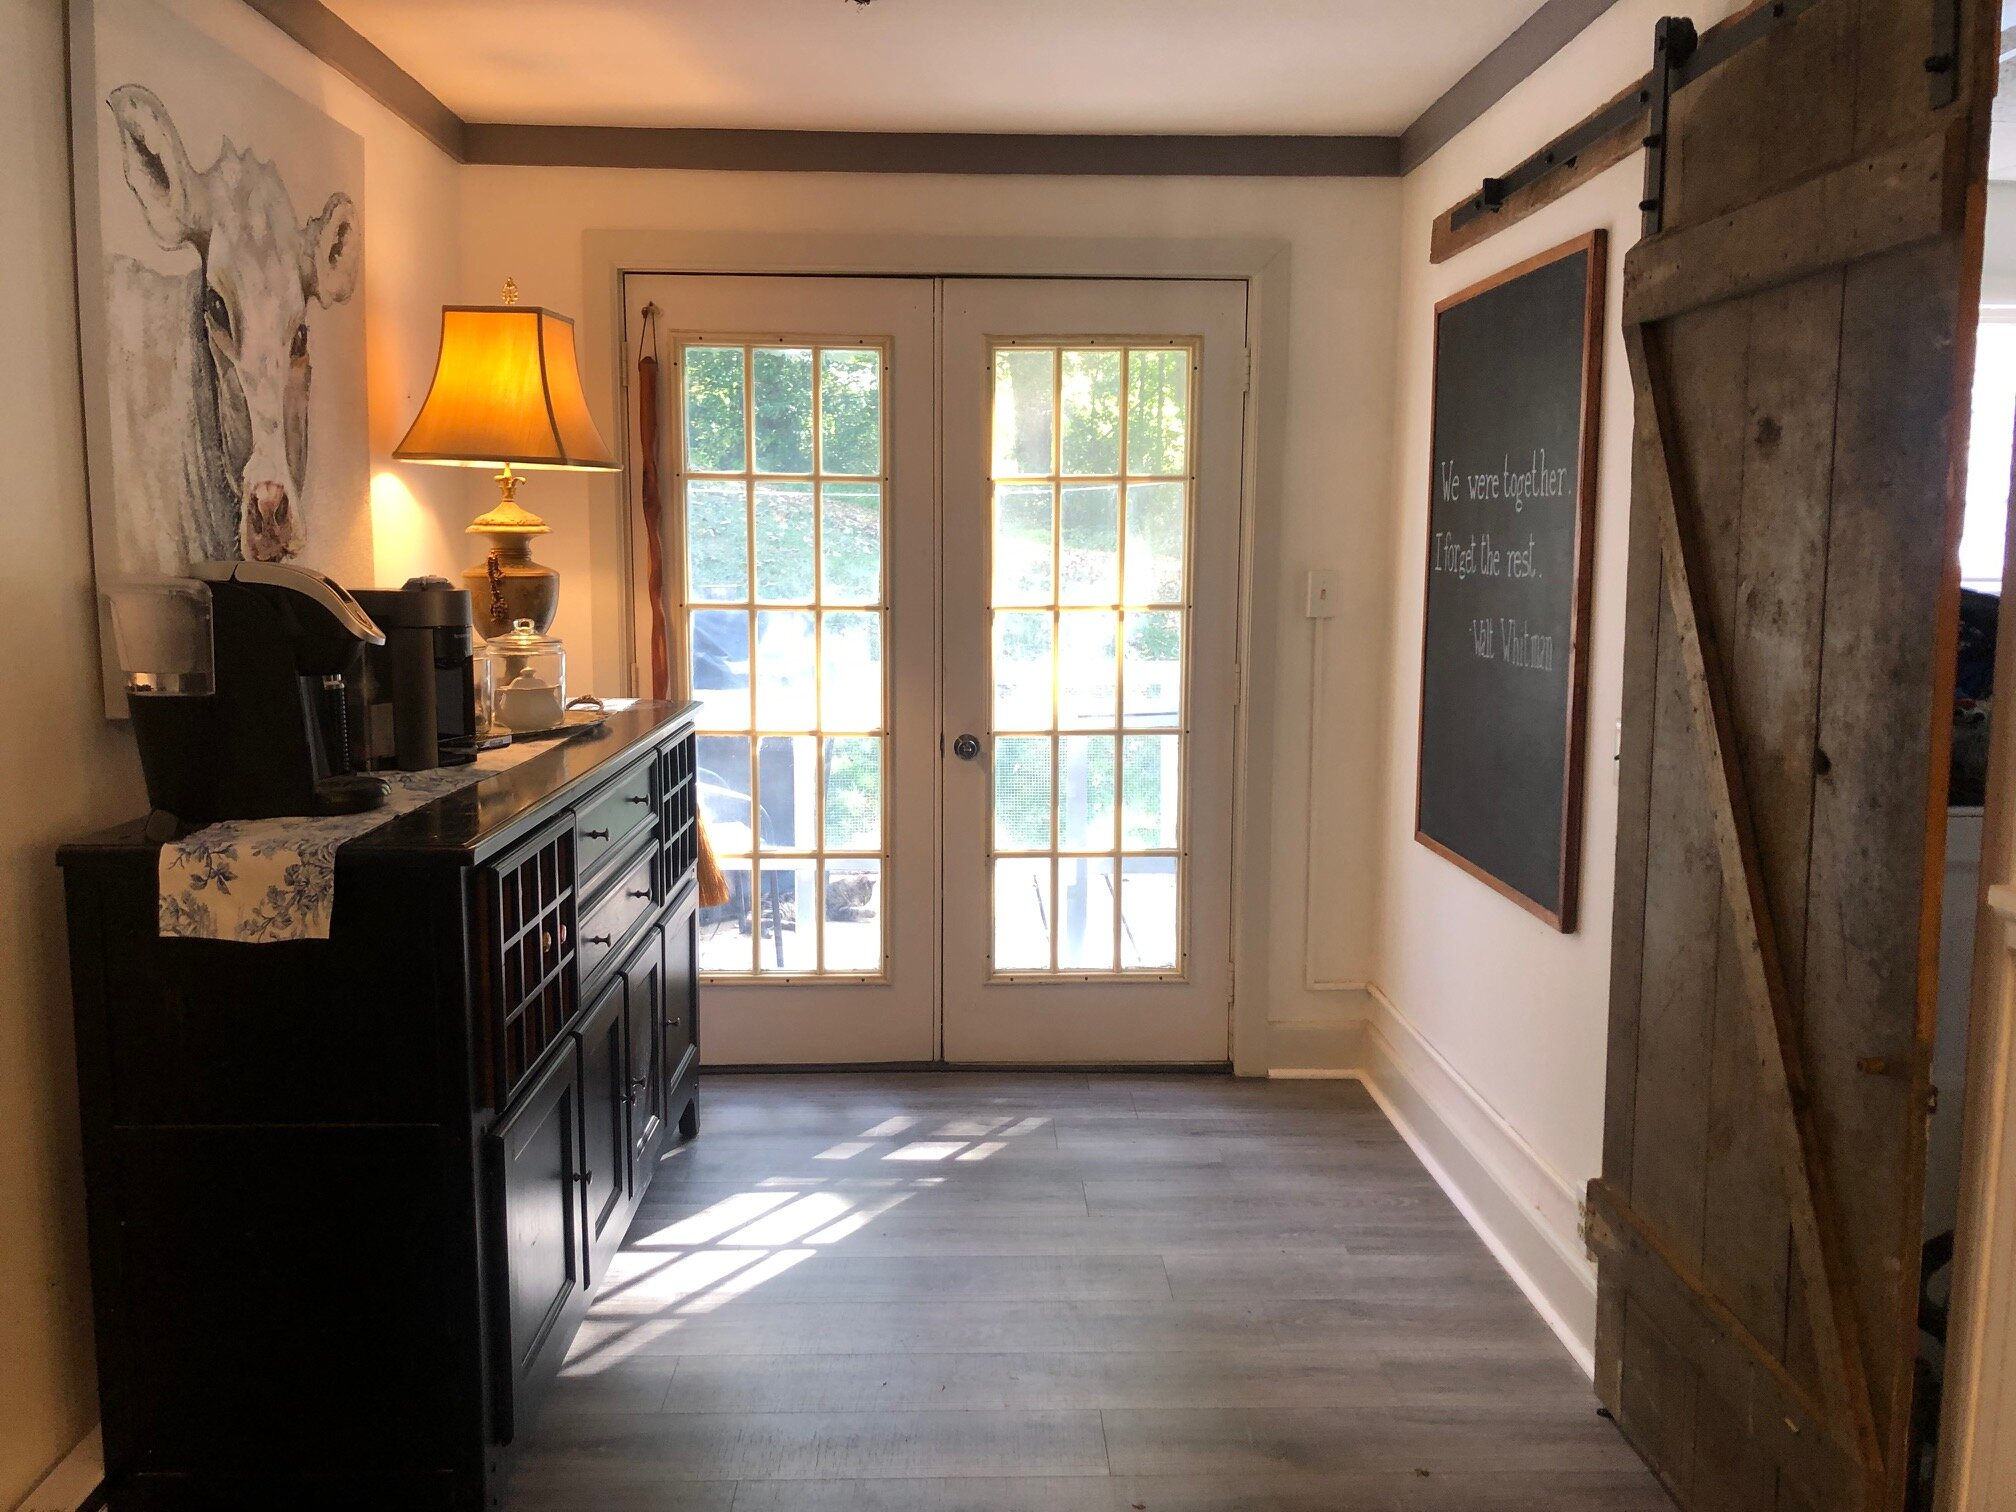 Kitchen Coffee Nook with Original Barn Door to Laundry